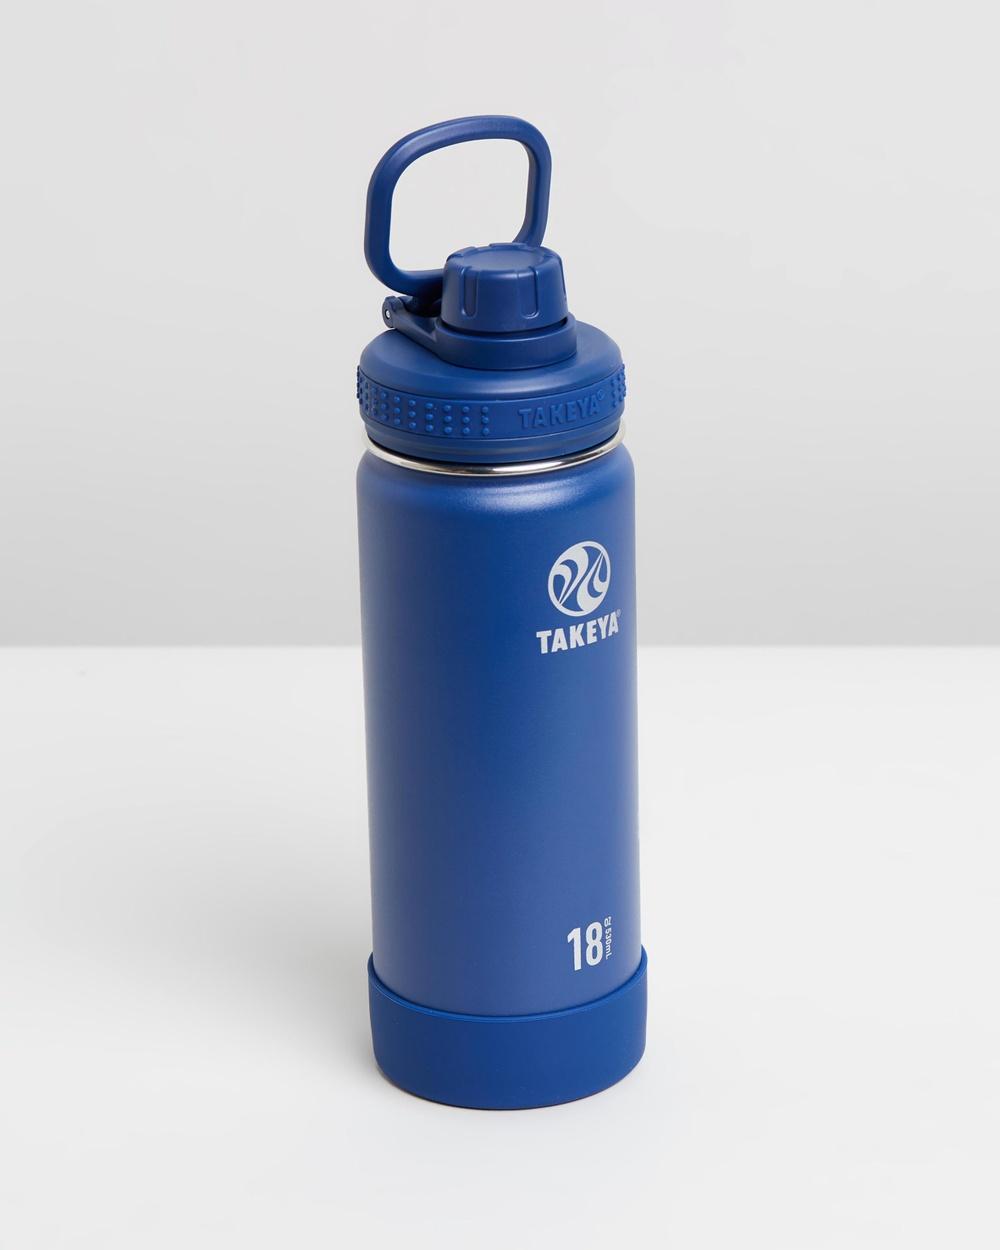 TAKEYA 530ml Insulated Stainless Steel Bottle 18oz Water Bottles Midnight